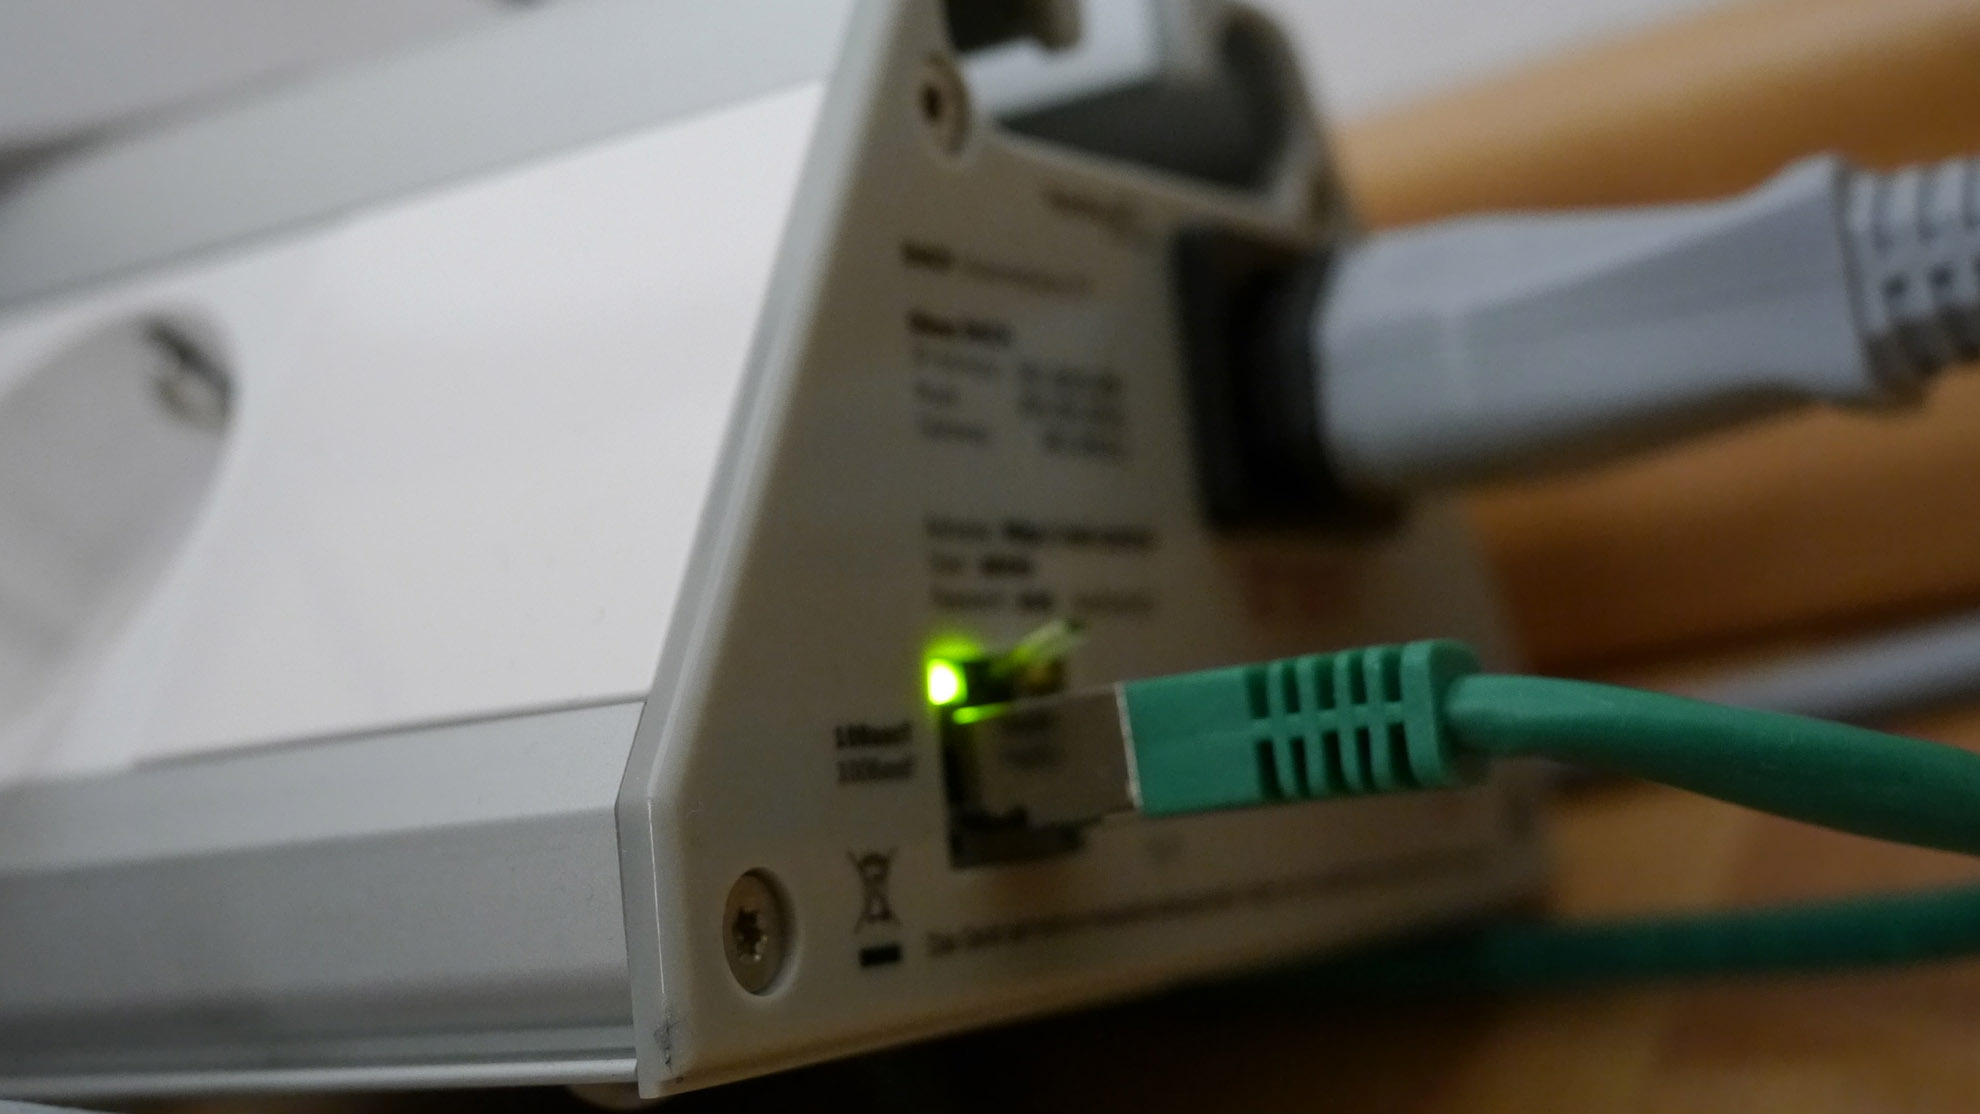 Netzwerke + Hardware